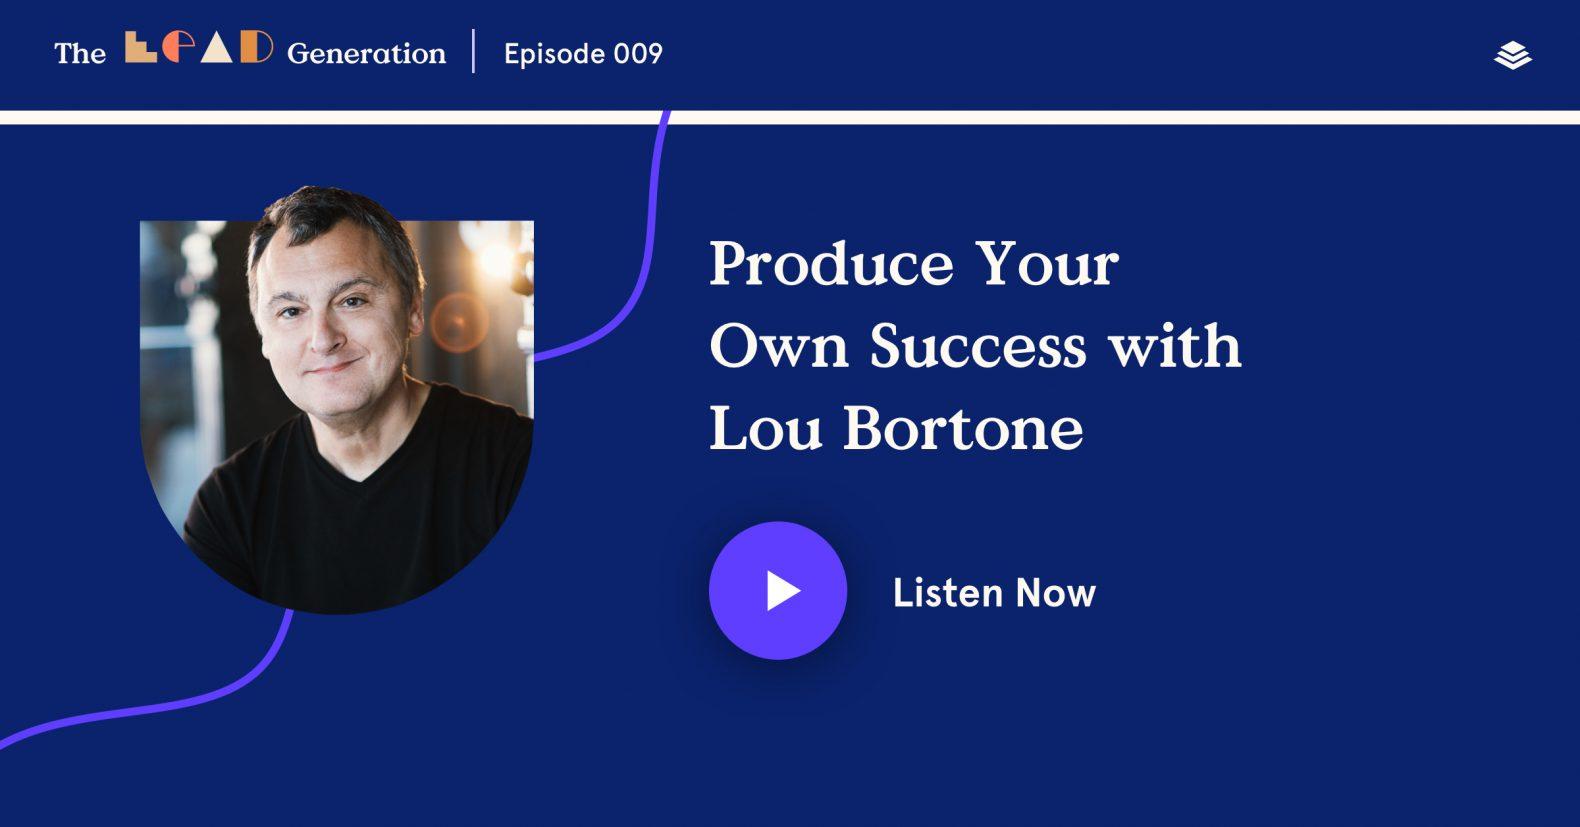 Lou Bortone - Produce Your Own Success